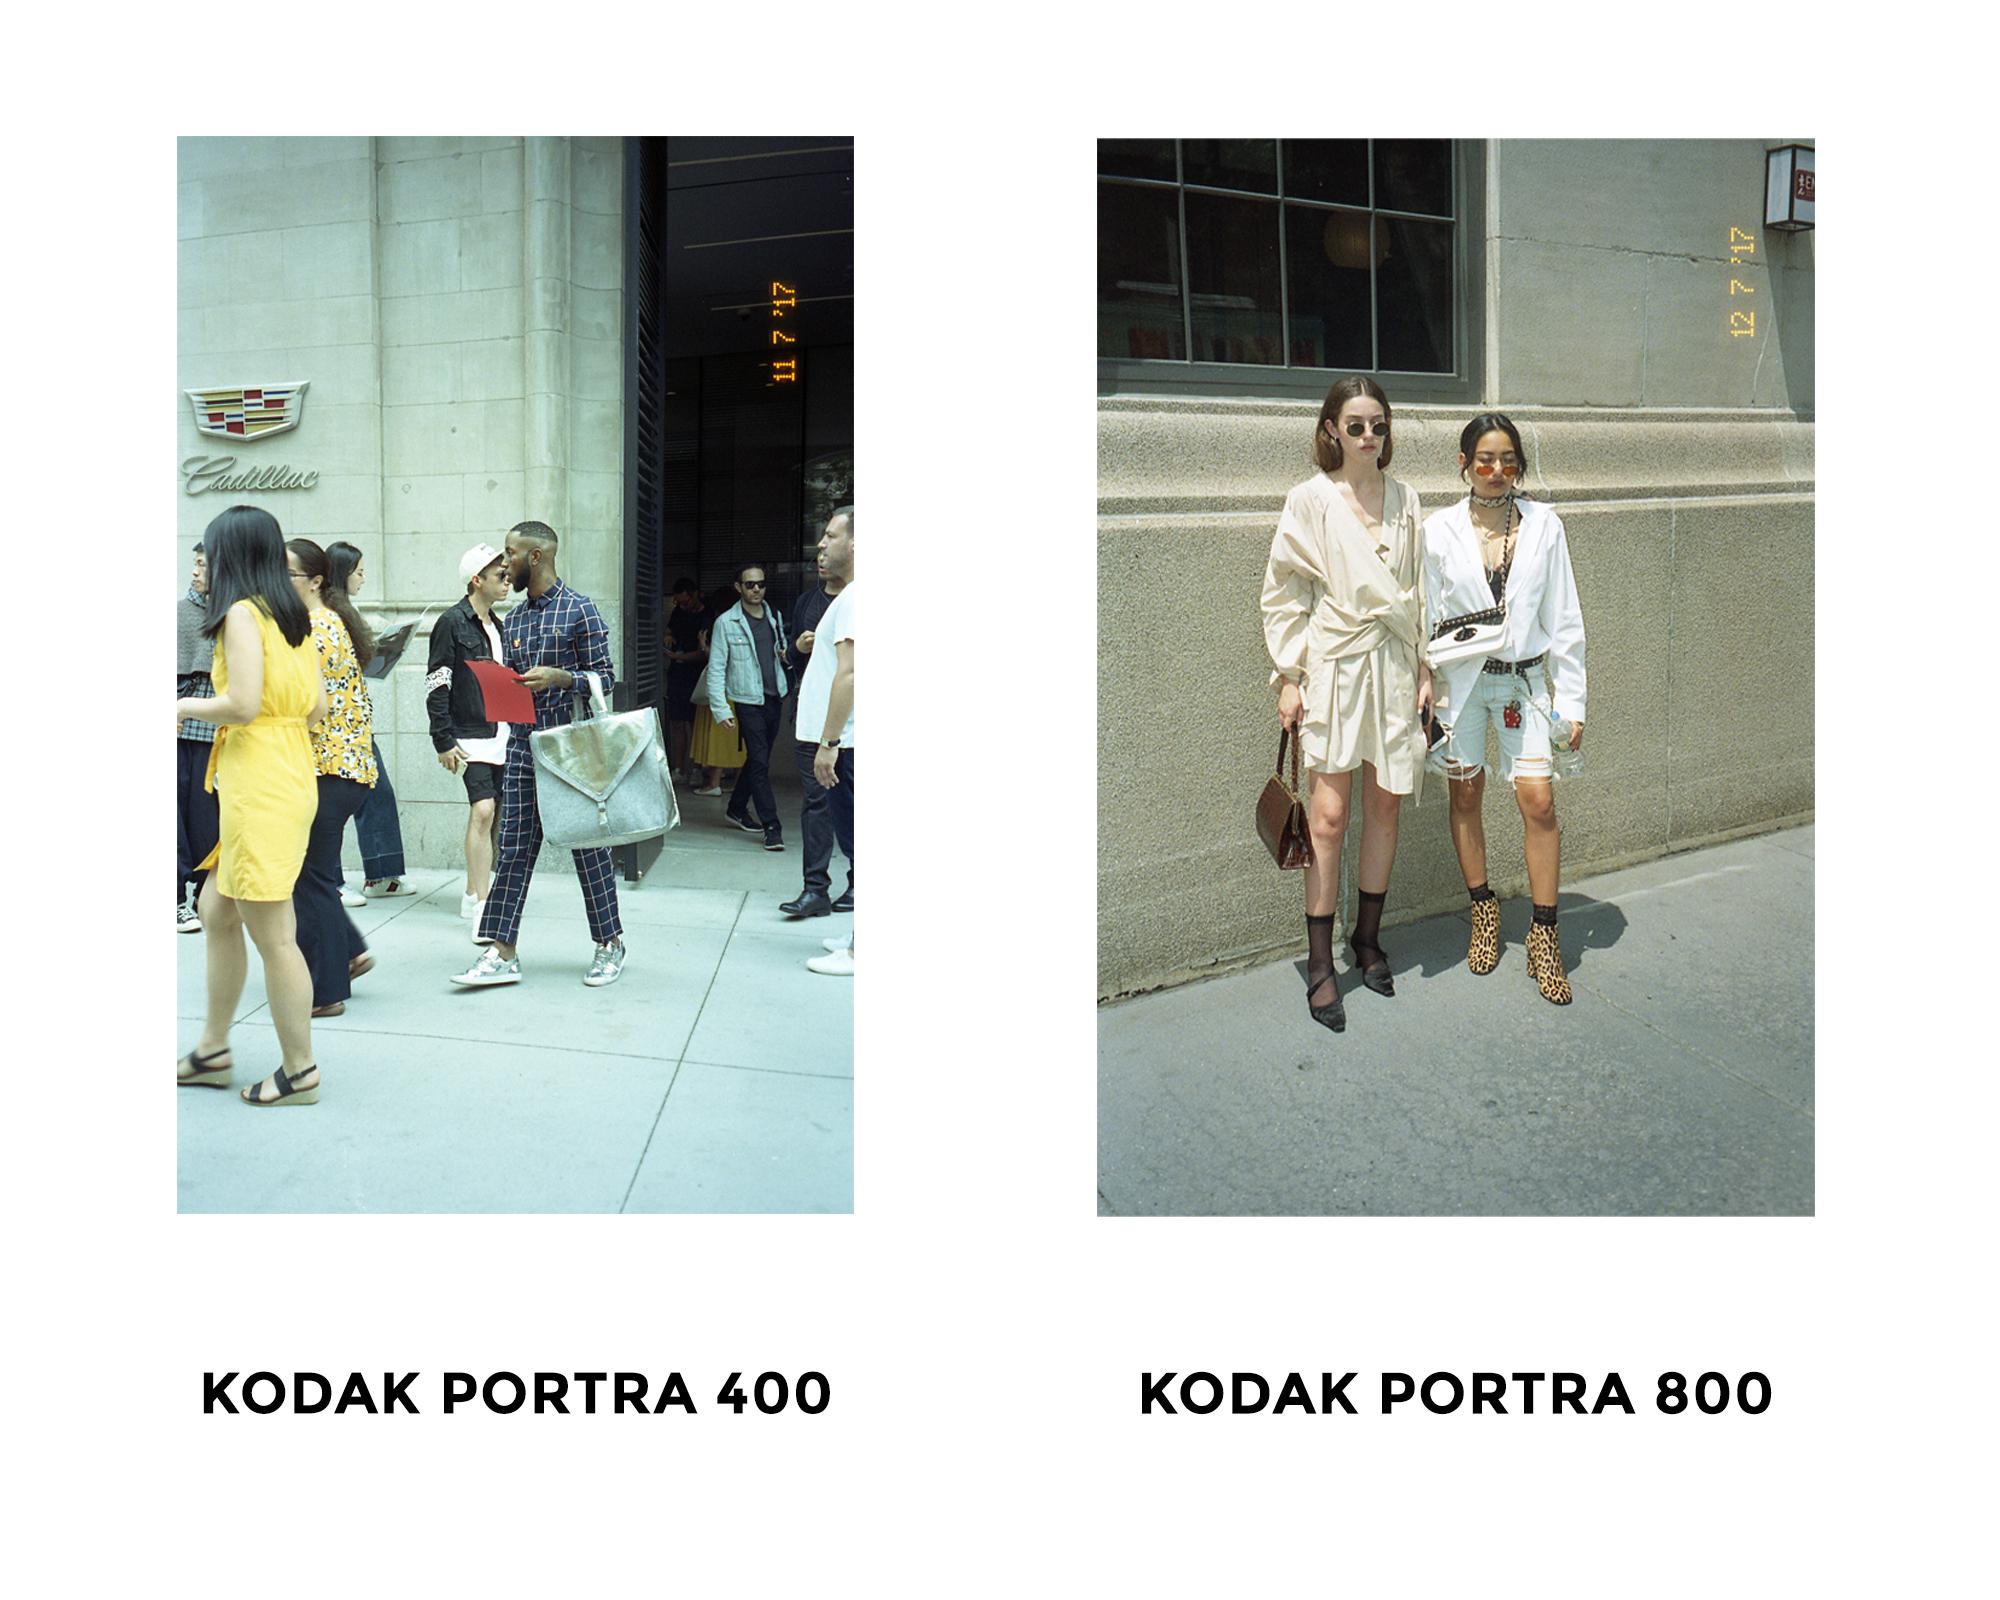 1 - Kodak Portra 400 vs. Kodak PortrA 800 - FILTERGRADE BLOG